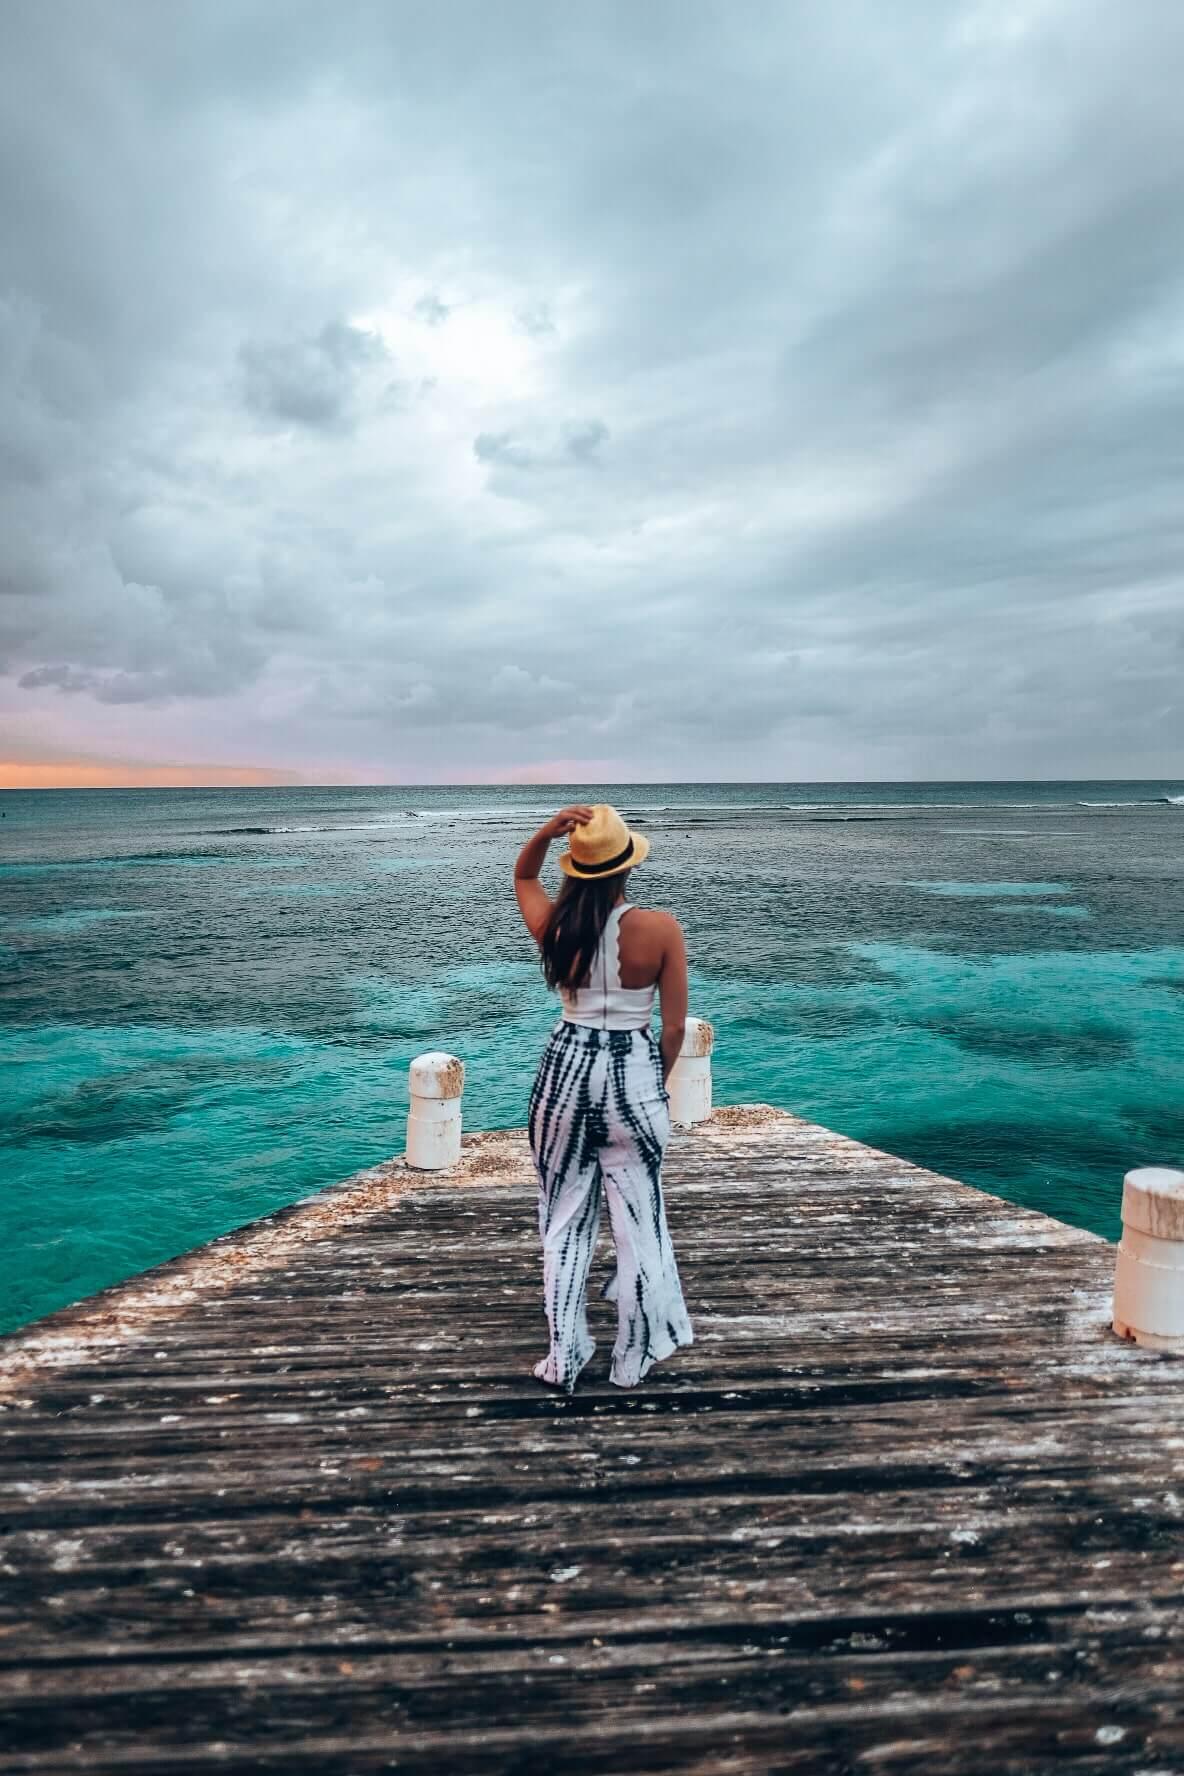 Sunrise in the Cayman Islands